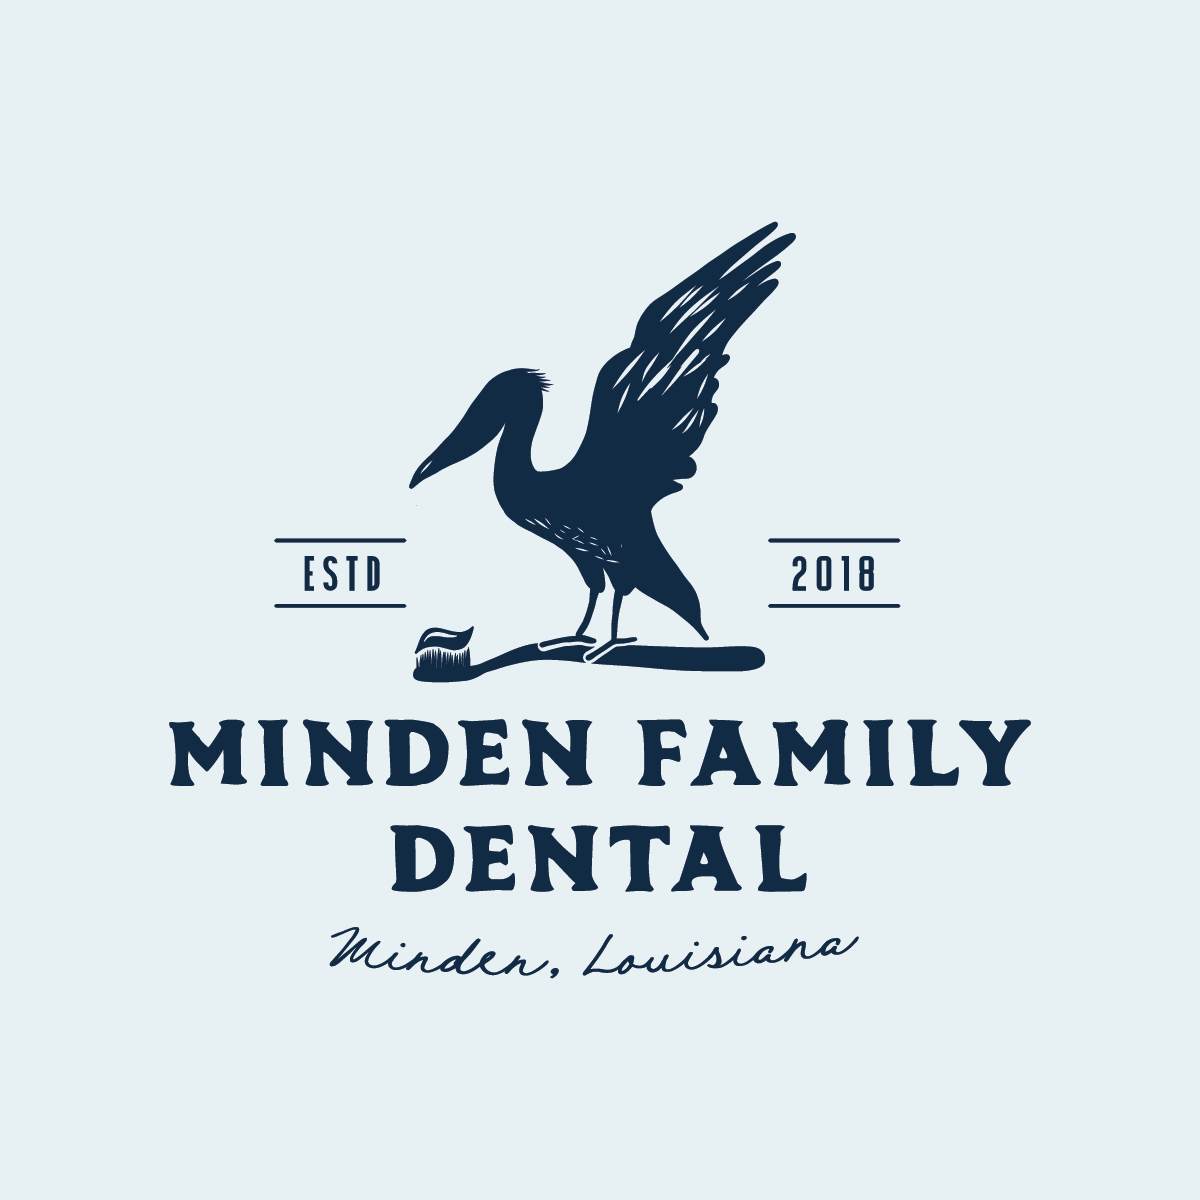 Minden Family Dental brand design by Pace Creative Design Studio